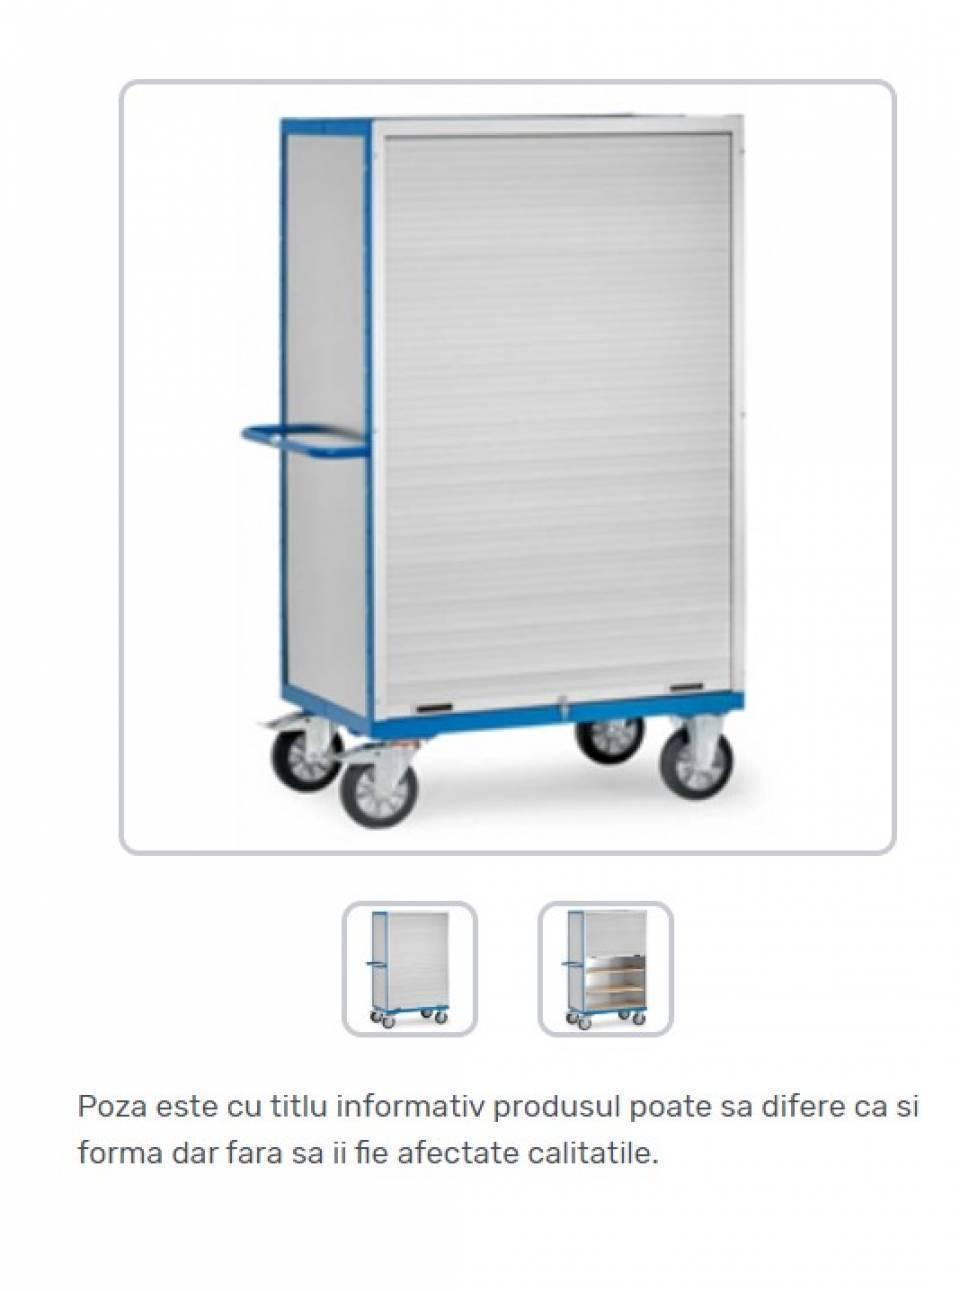 Roll container pentru transport valori42178